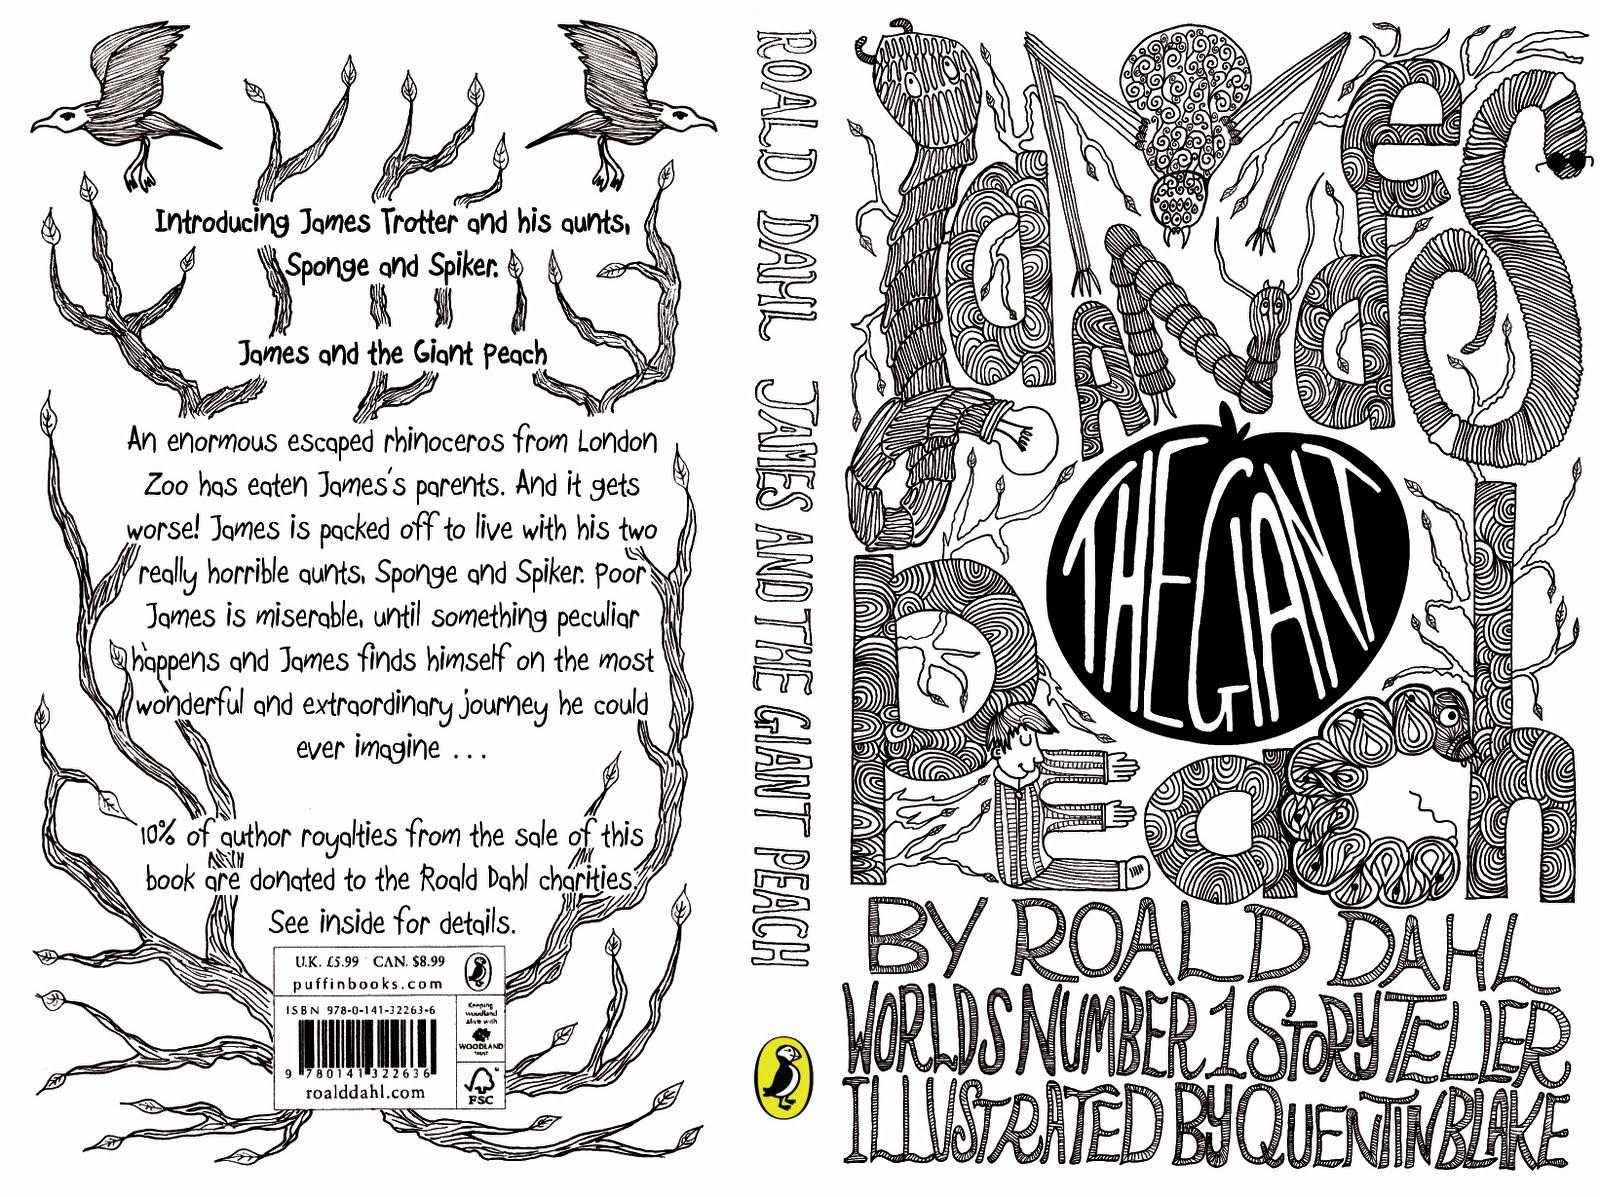 12 Perm Author Roald Dahl